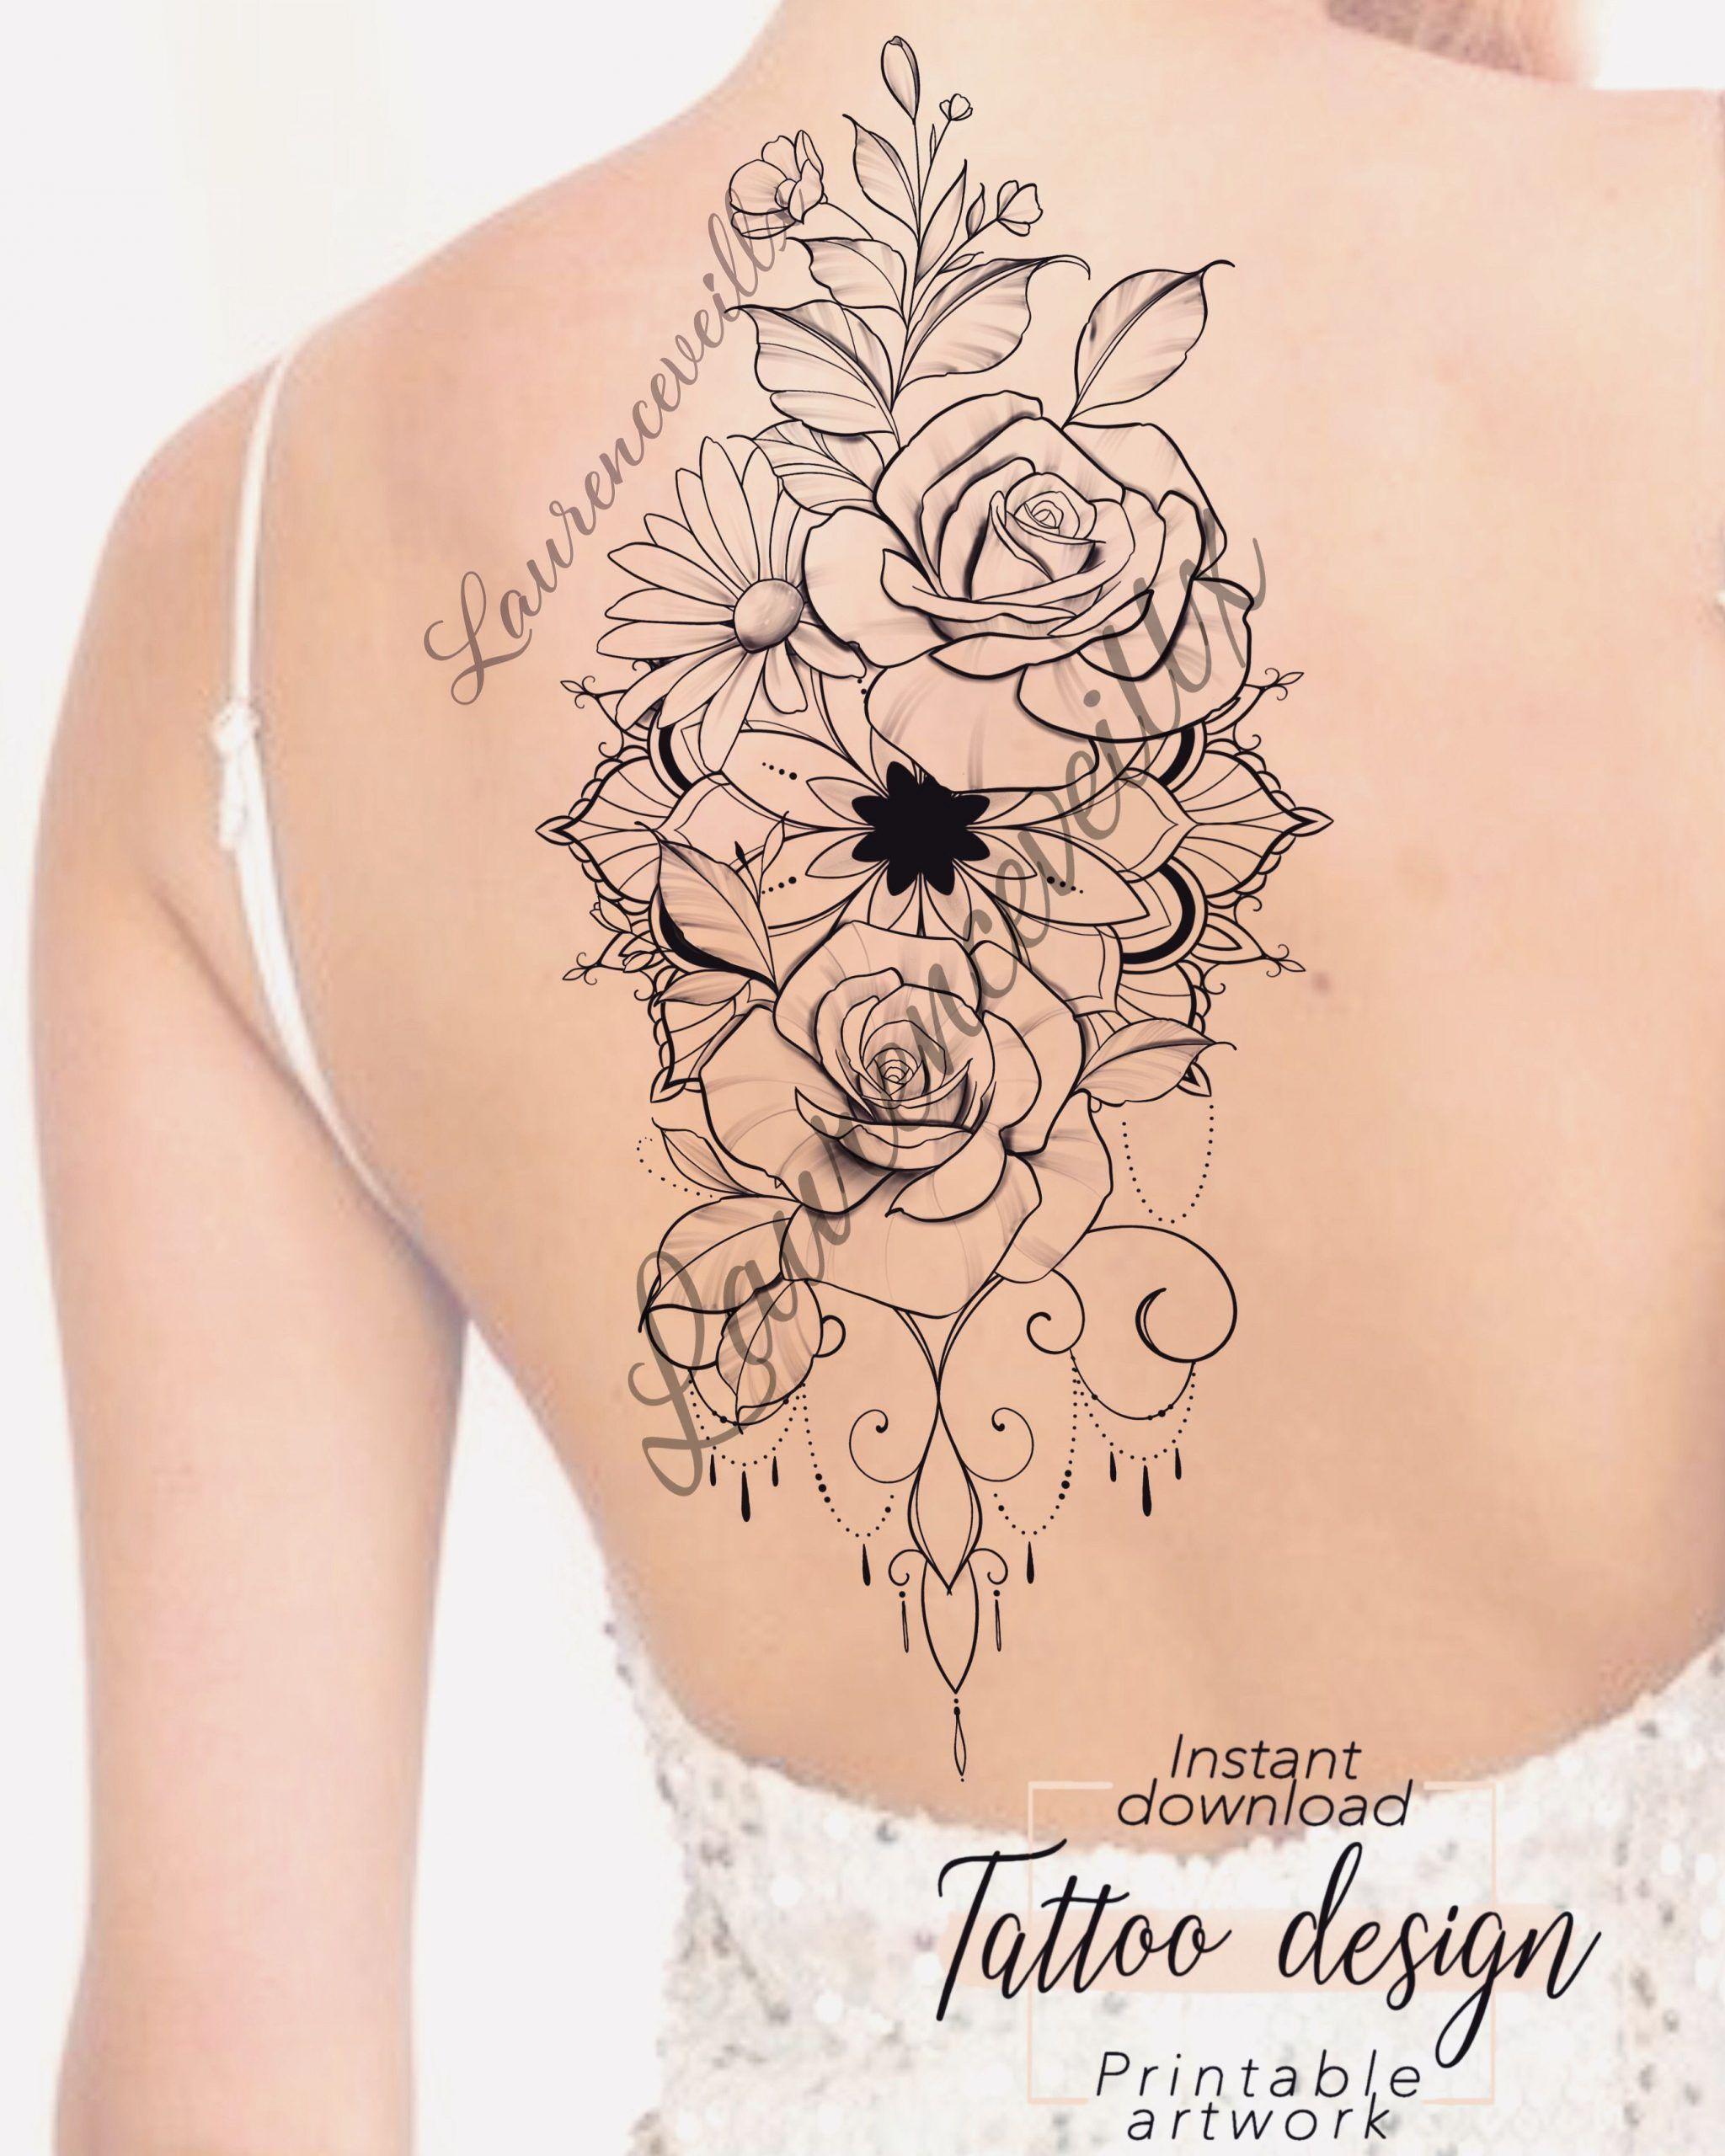 Daisy Flower Rose Mandala Unique Tattoo Design Available On Etsy Laurenceveillx Daisy Design Etsy Flower L In 2020 Tattoos Tattoo Designs Unique Tattoos For Women